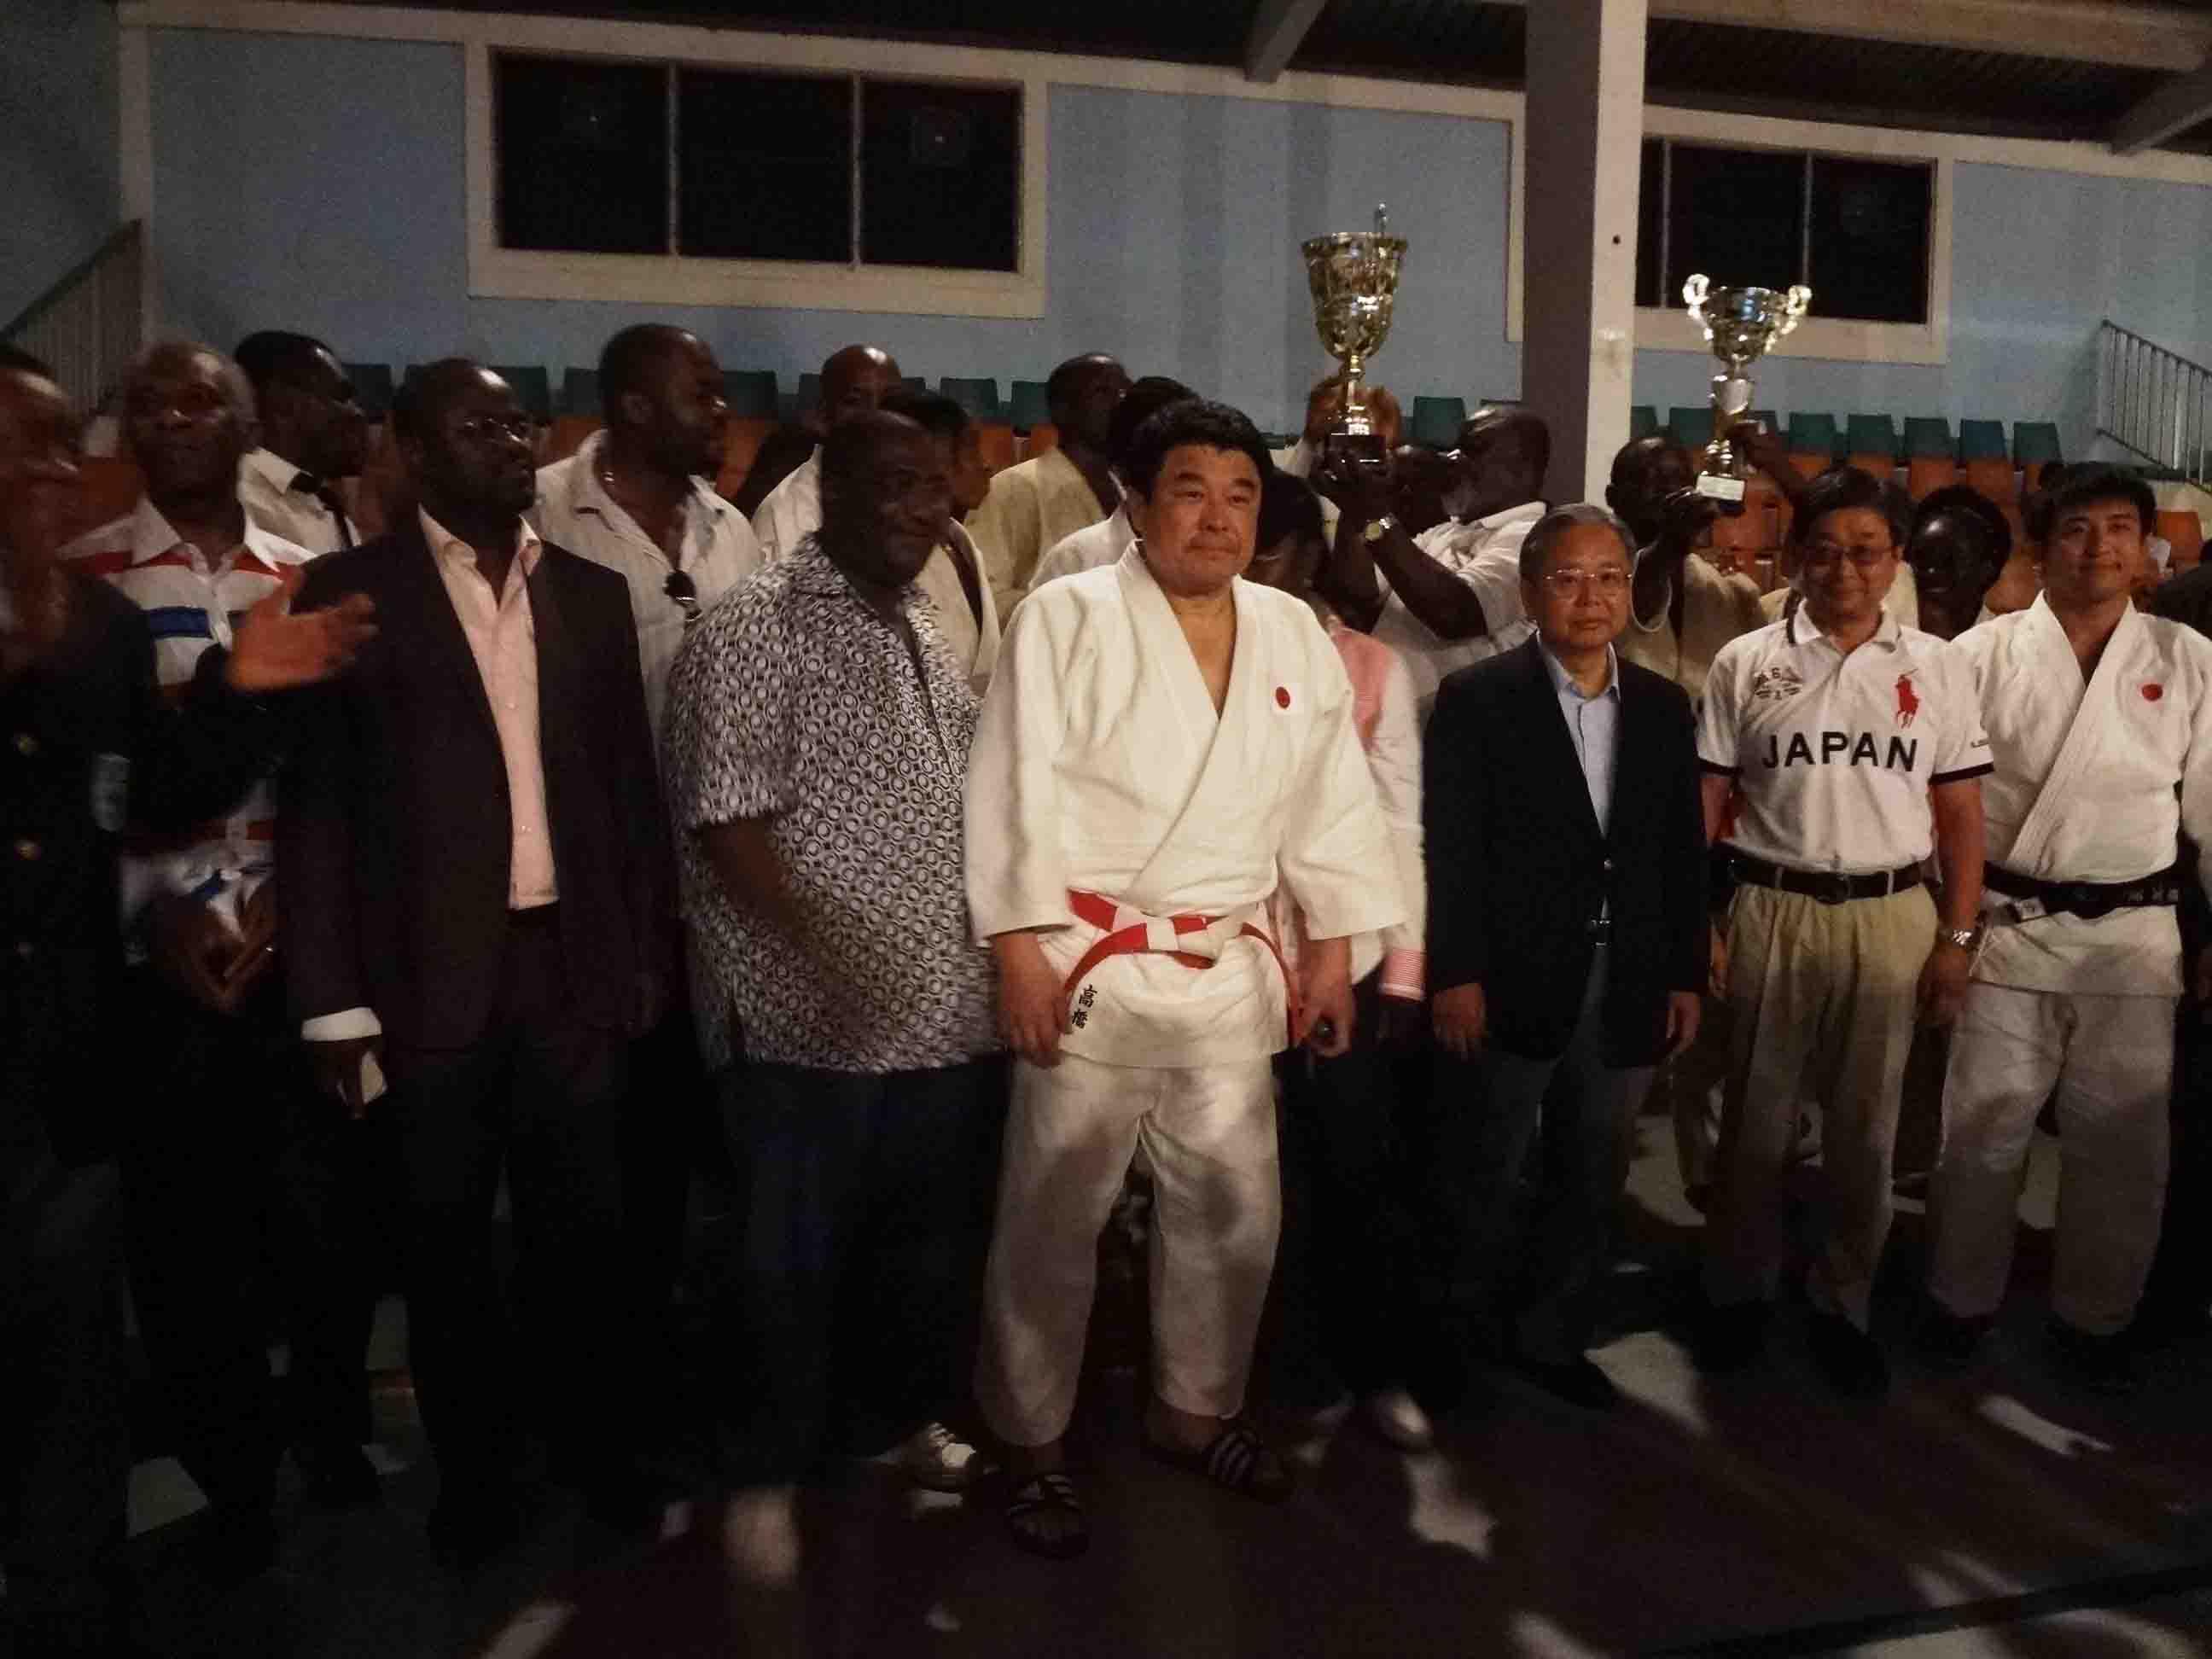 Manifestations culturelles : Ambassade